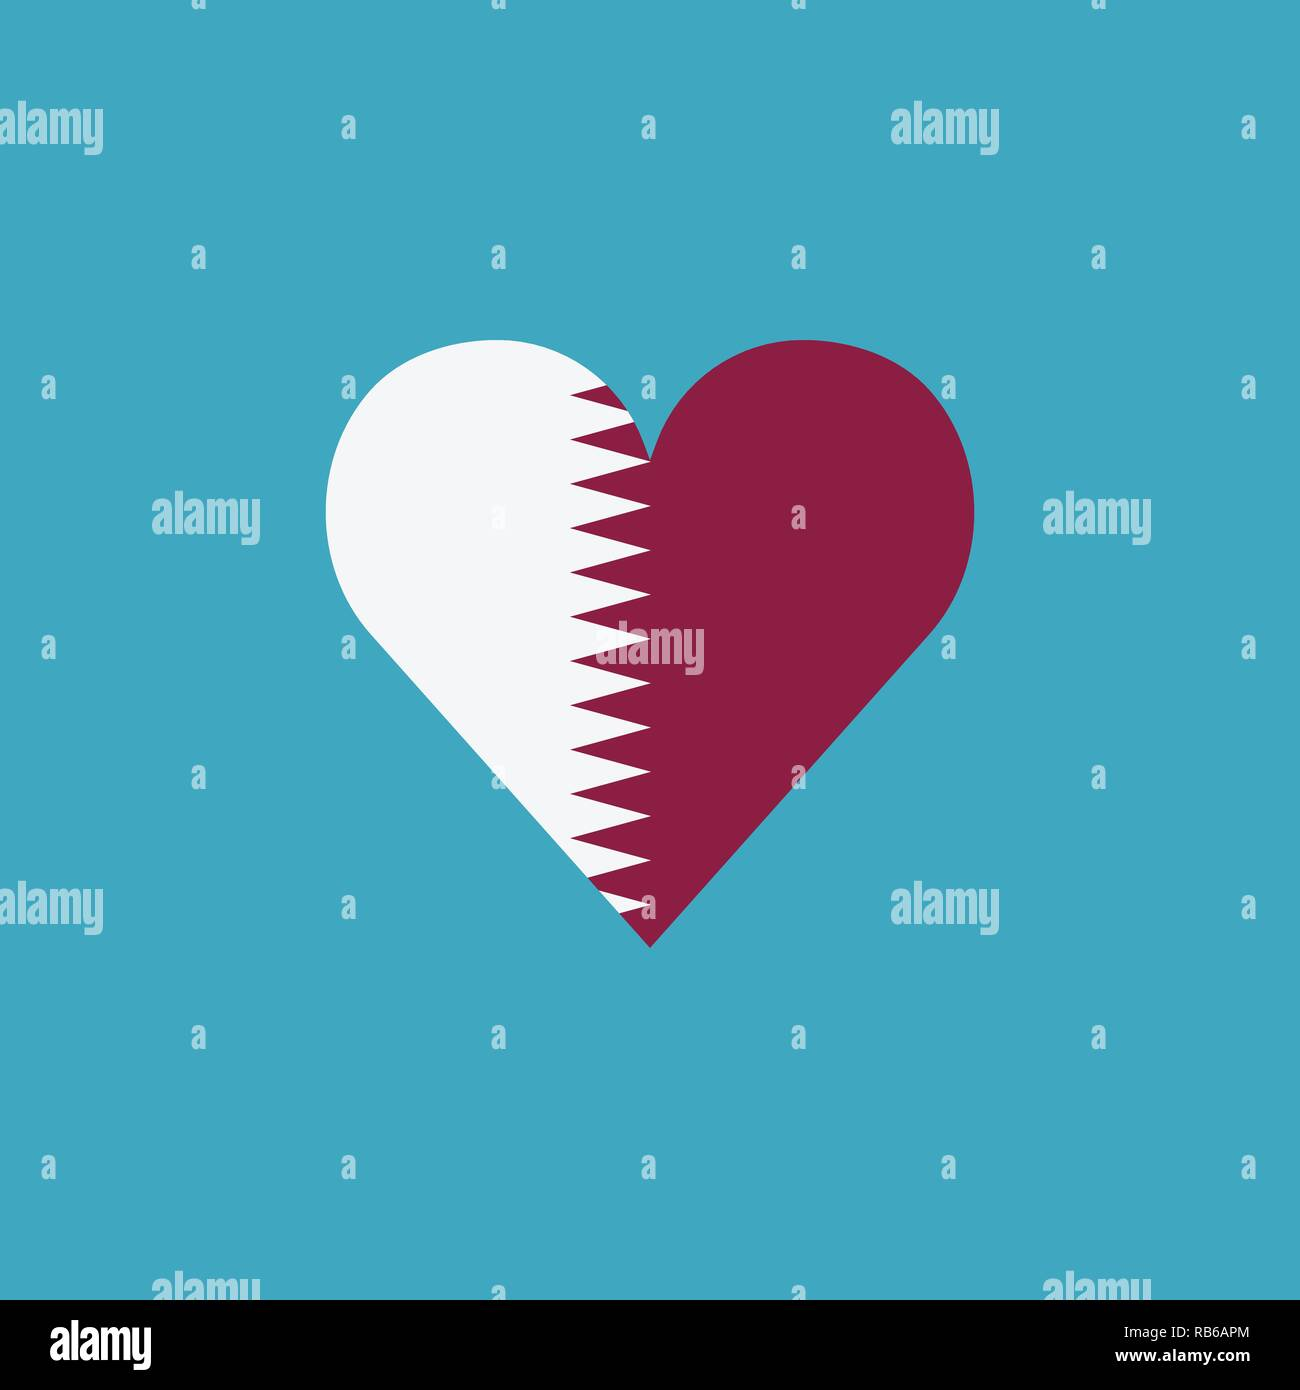 Qatar National Day Icon Vector Vectors Stock Photos & Qatar National